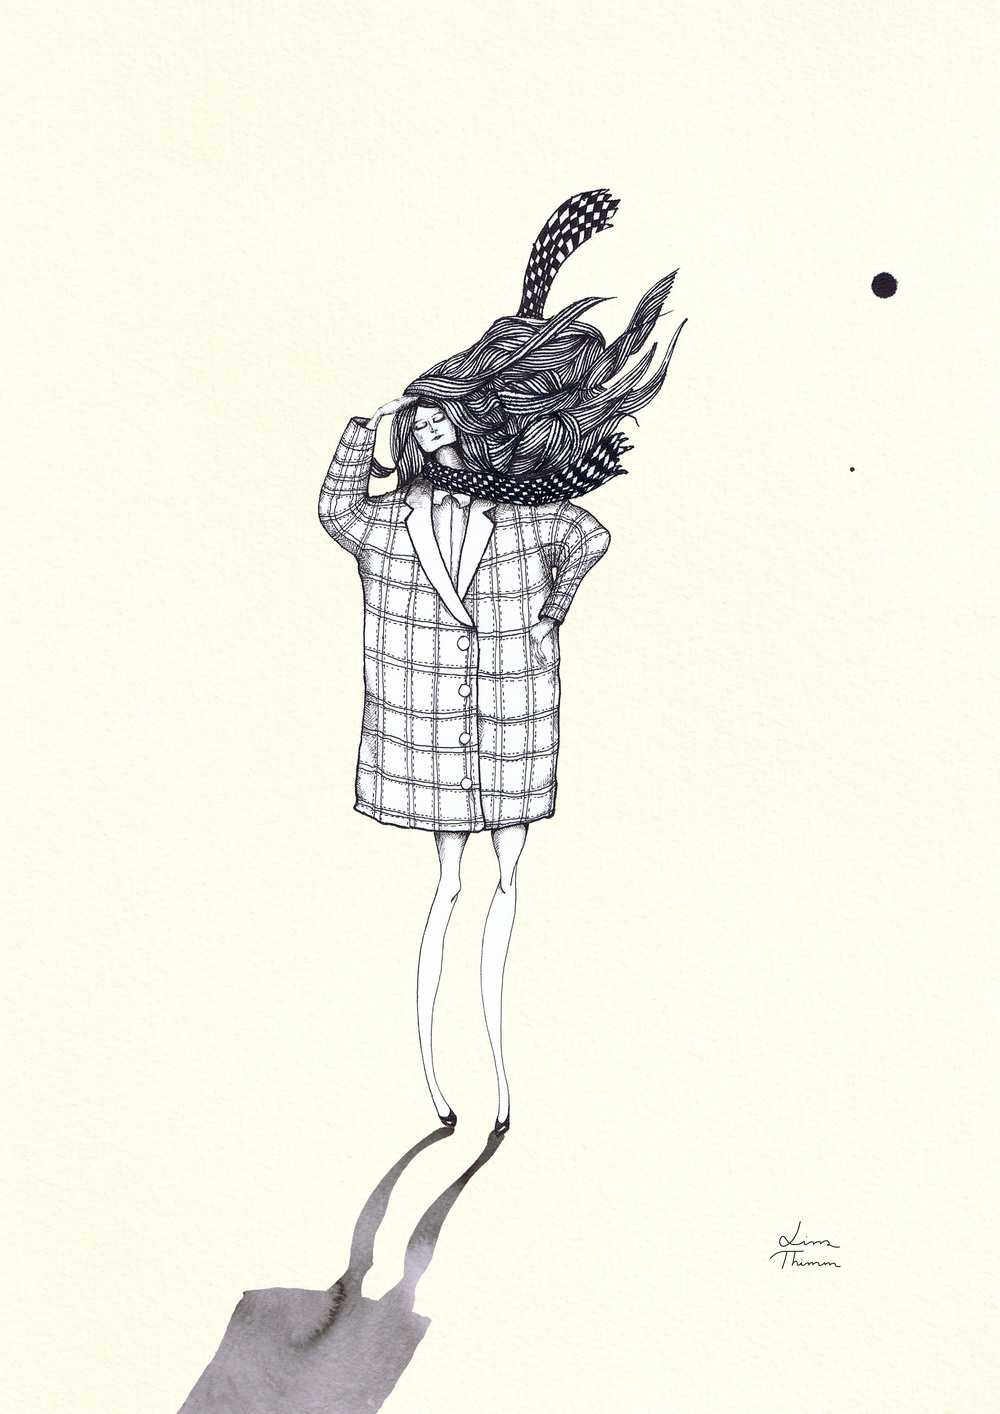 Lissa Thimm Windy.jpg